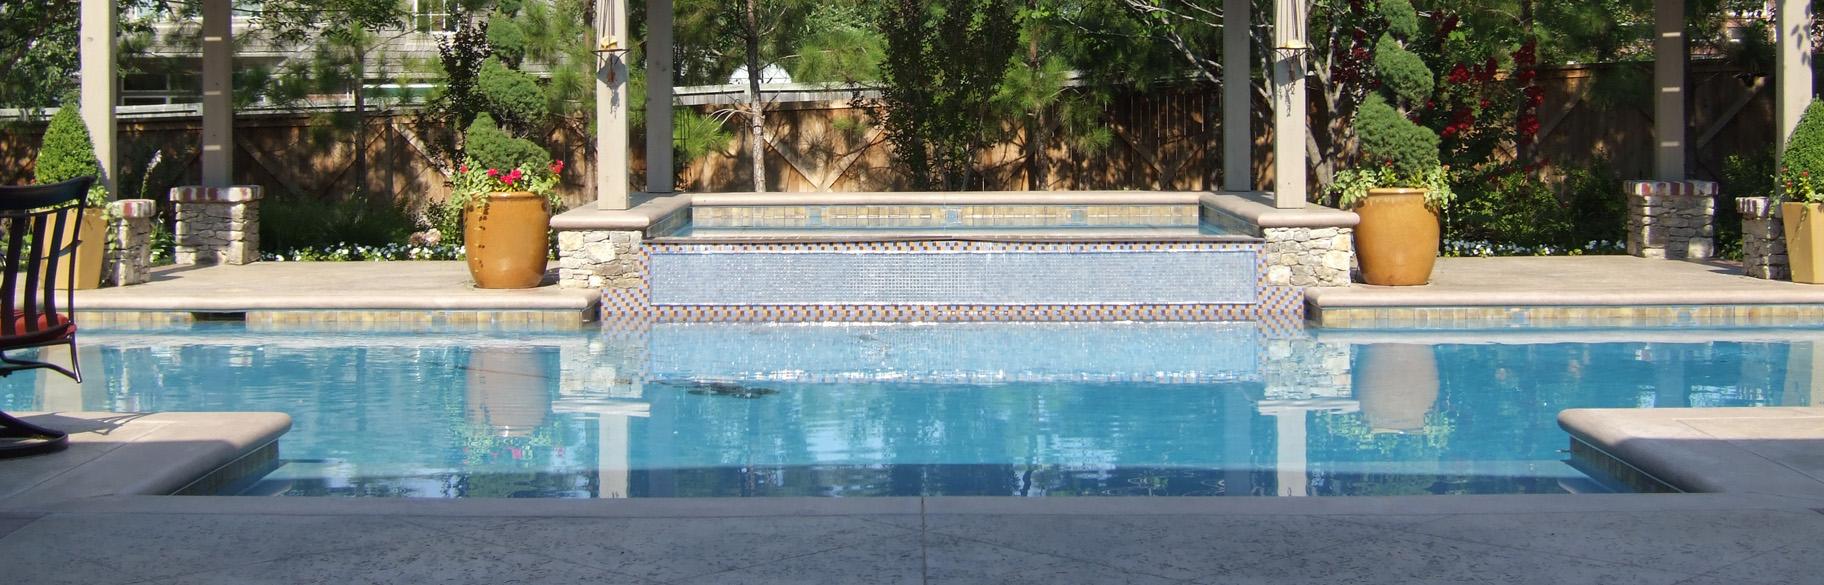 Pools & Patios 3